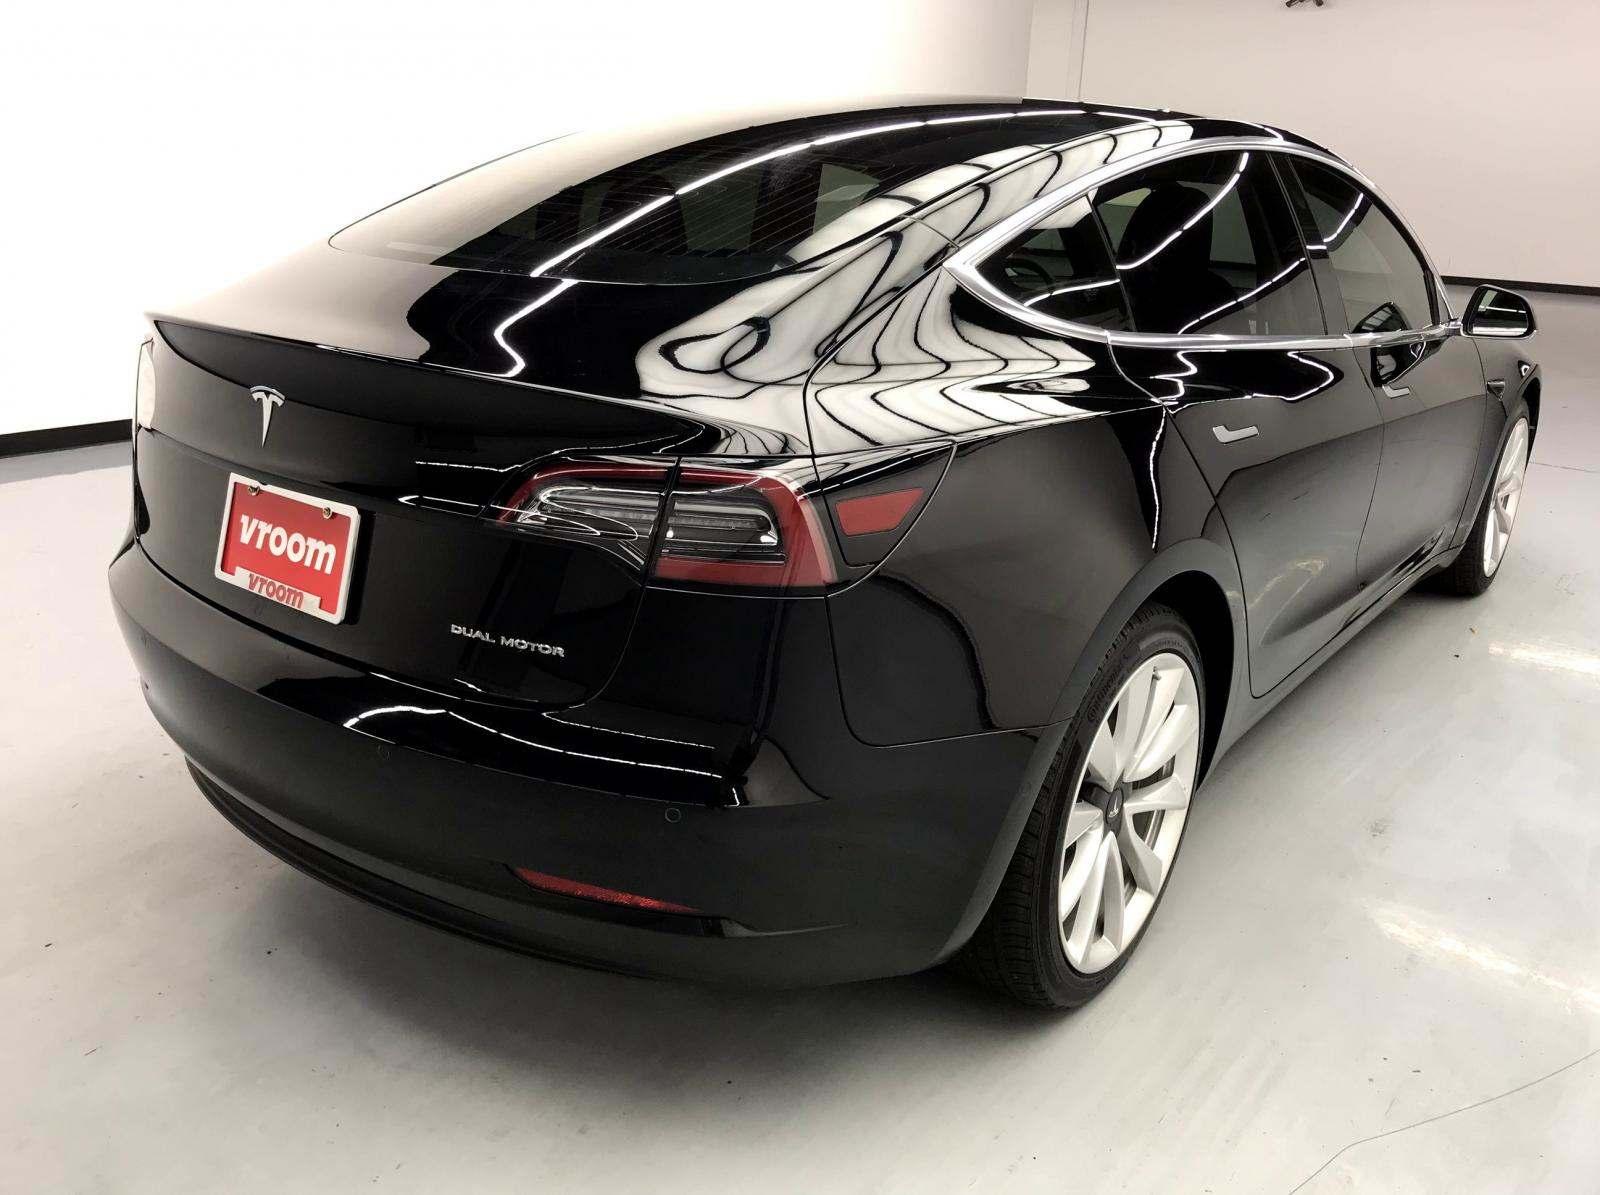 2019 Tesla Model 3 $48280.00 for sale in Stafford, TX ...